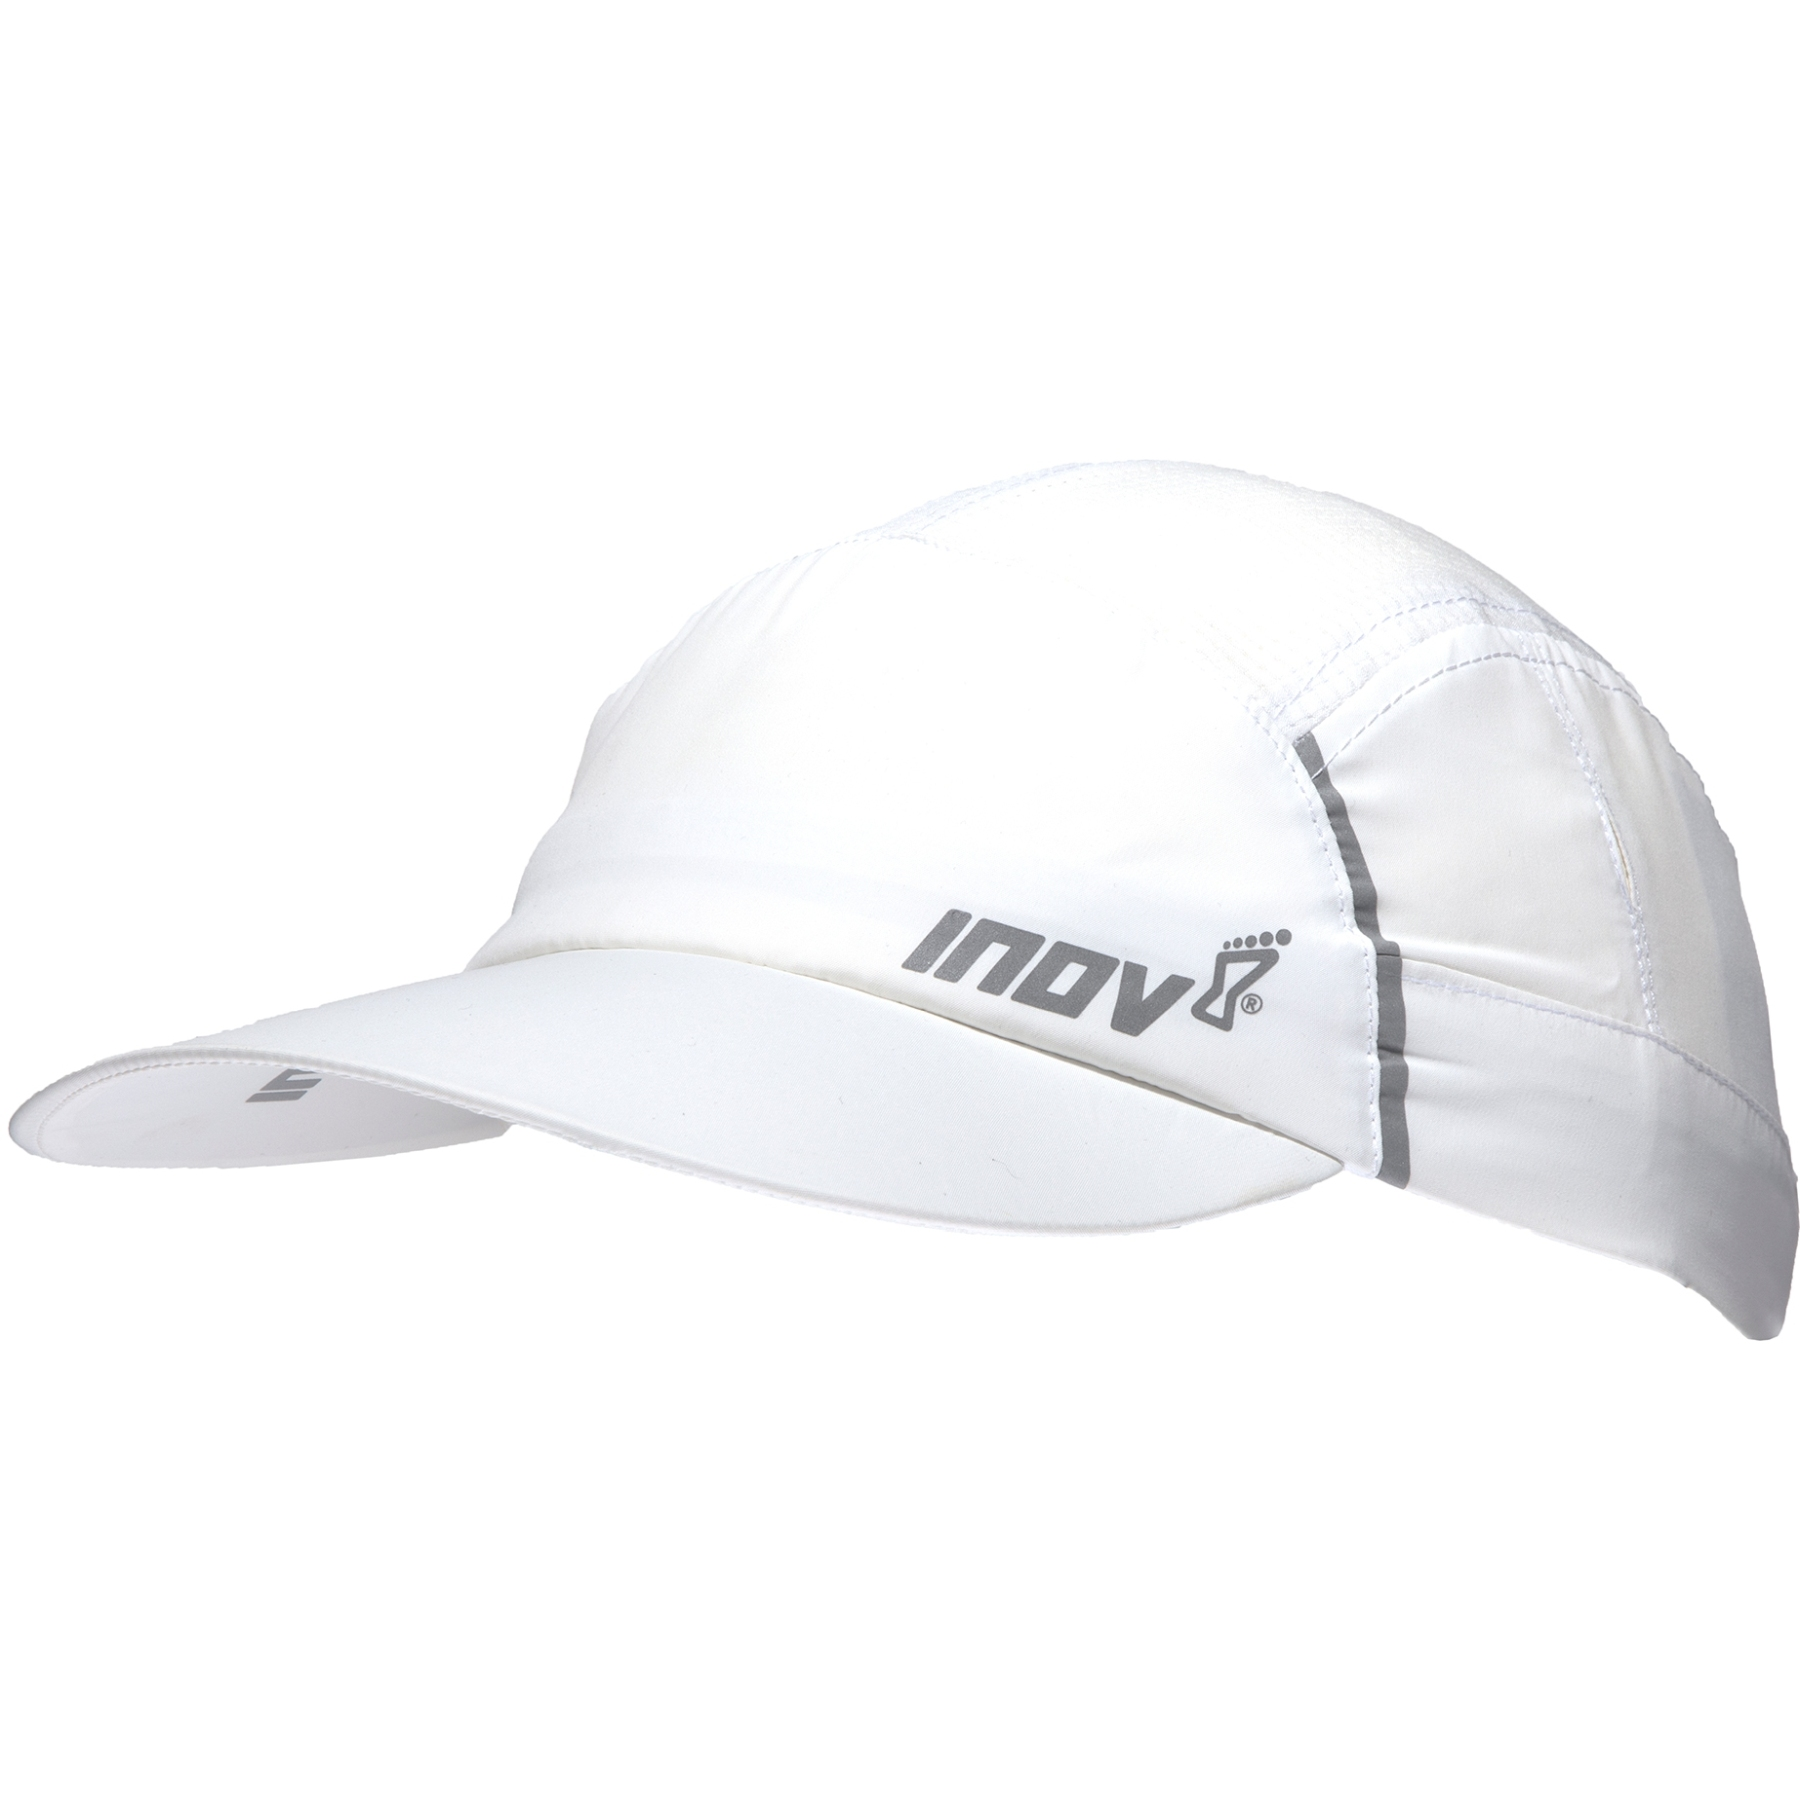 Inov-8 Race Elite™ Peak 2.0 Laufmütze - white